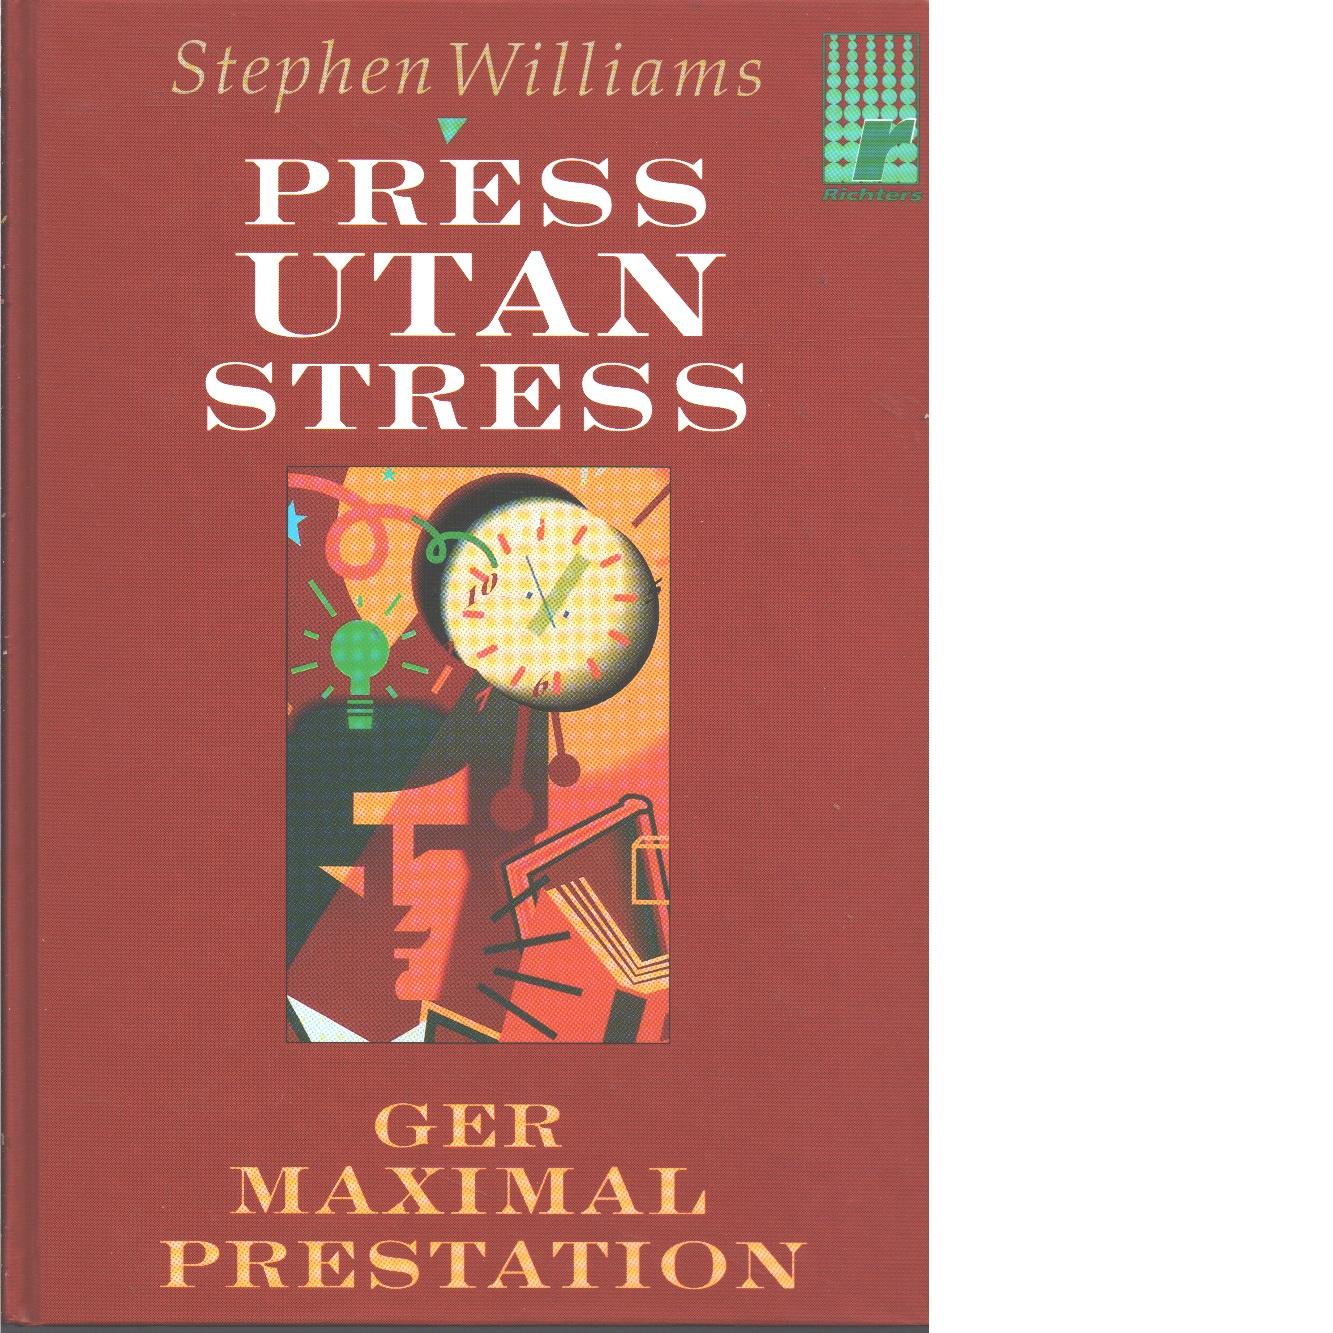 Press utan stress ger maximal prestation - Williams, Stephen